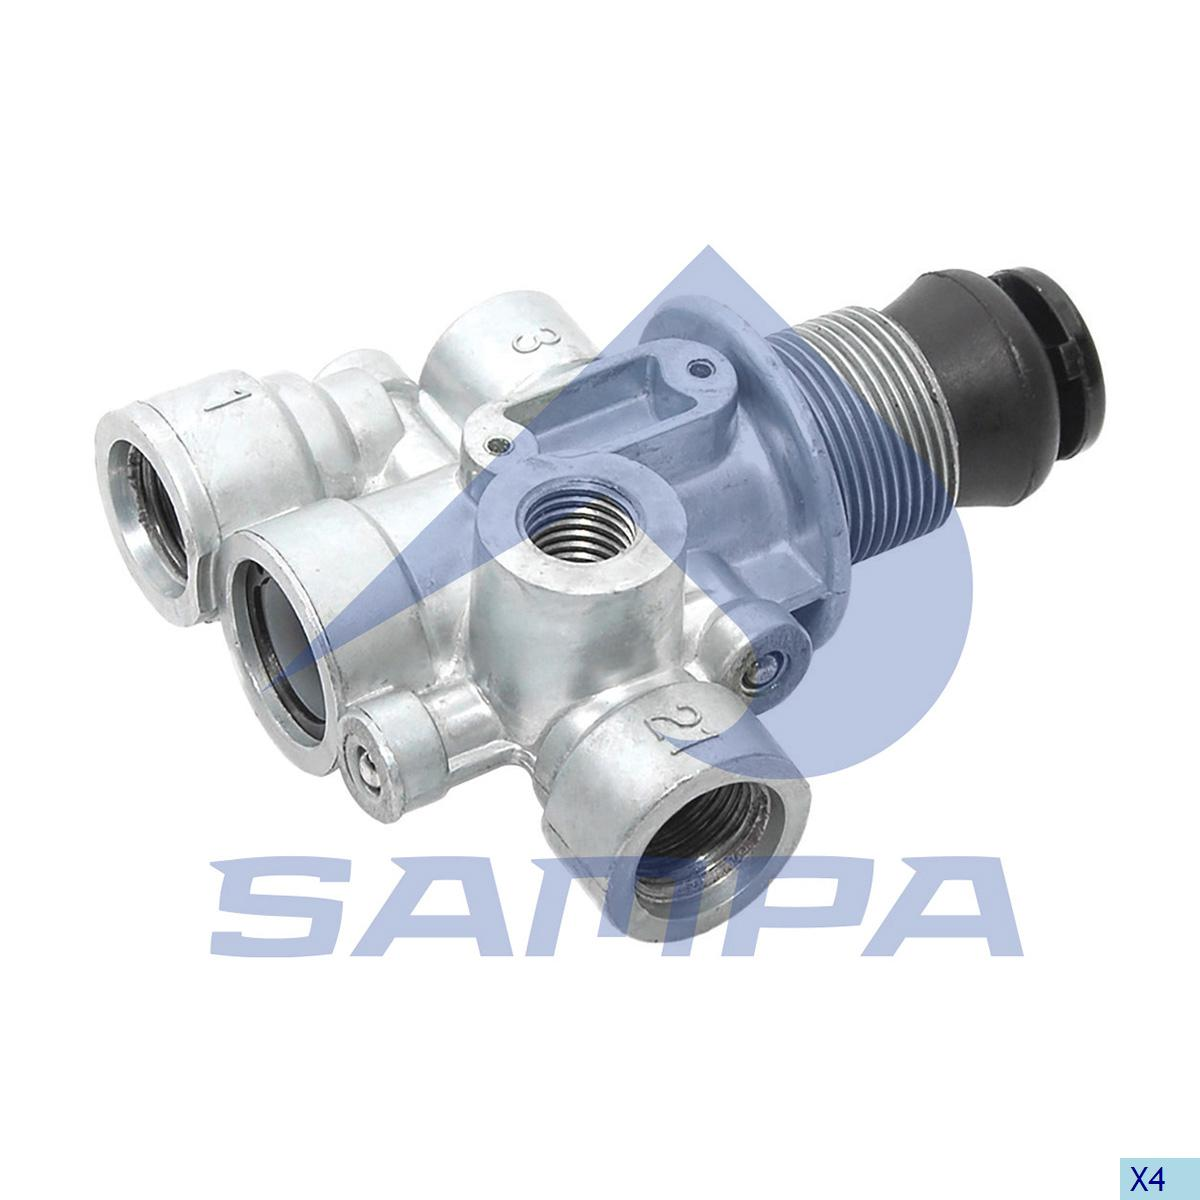 Multiway Valve, Mercedes, Compressed Air System